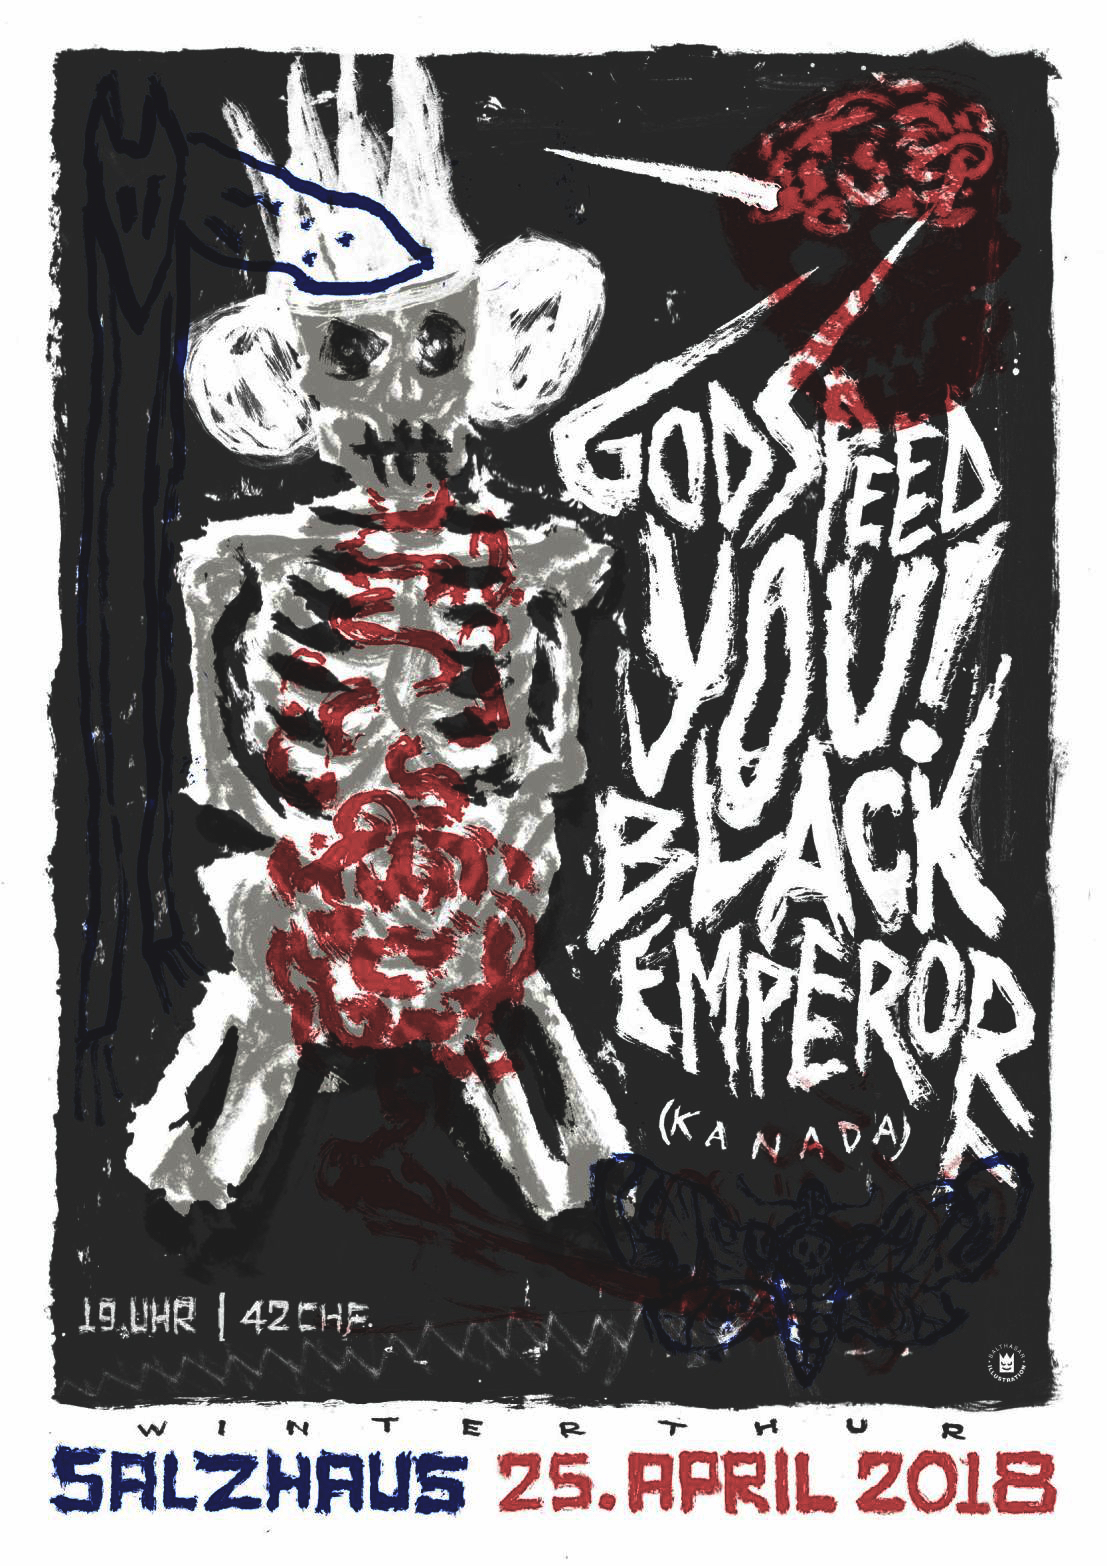 GODSPEED! YOU BLACK EMPEROR